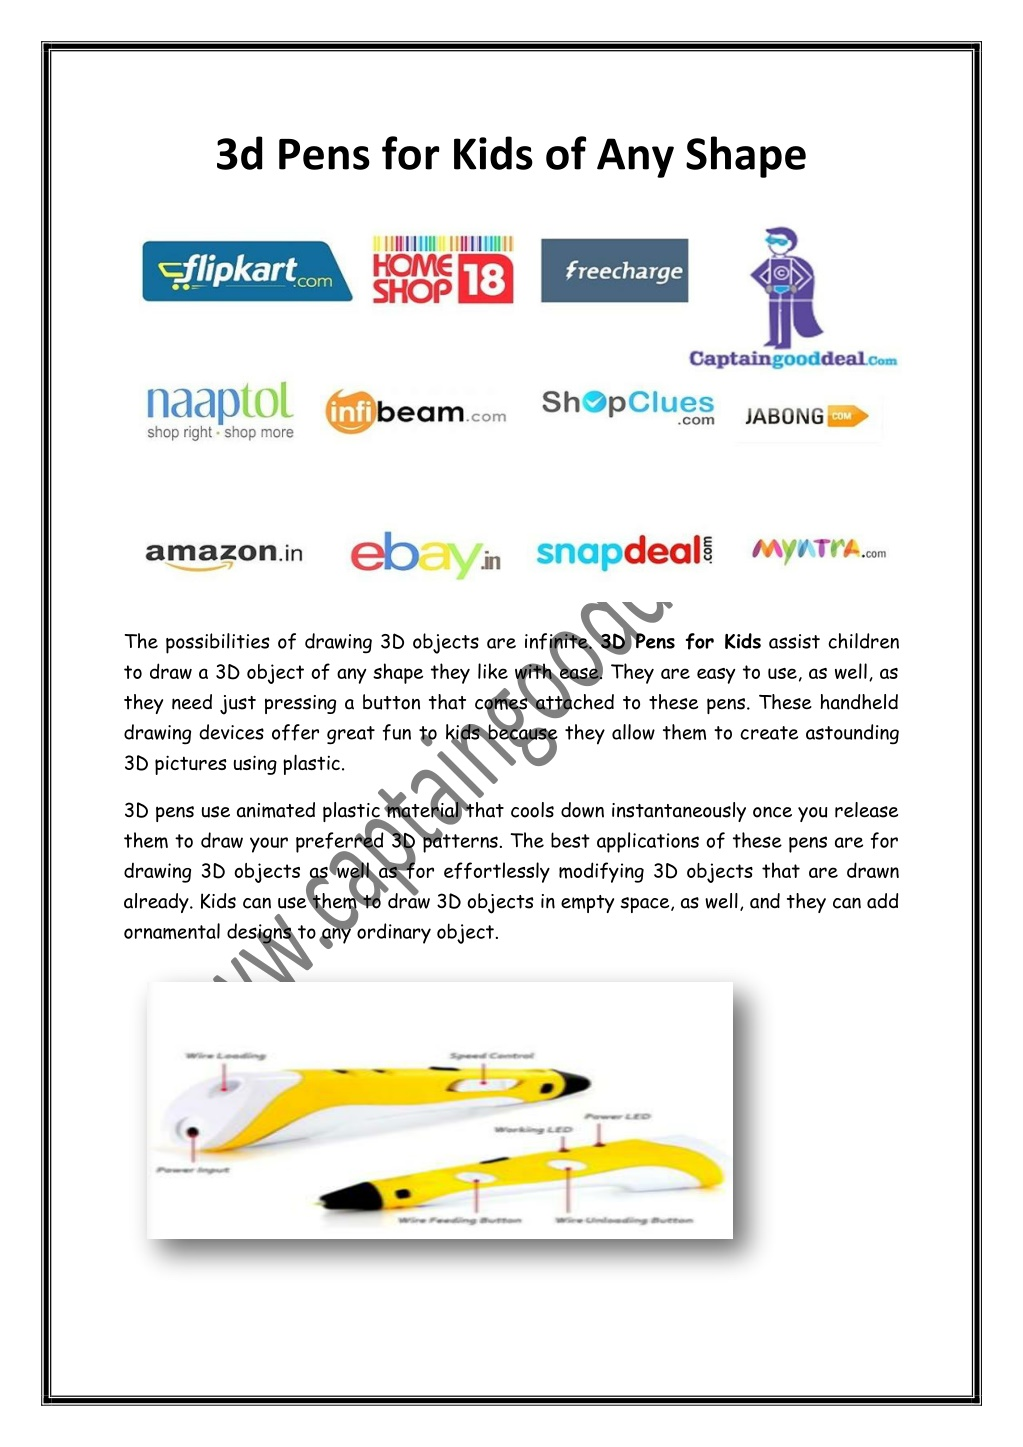 3D Pens for Kids of Any Shape